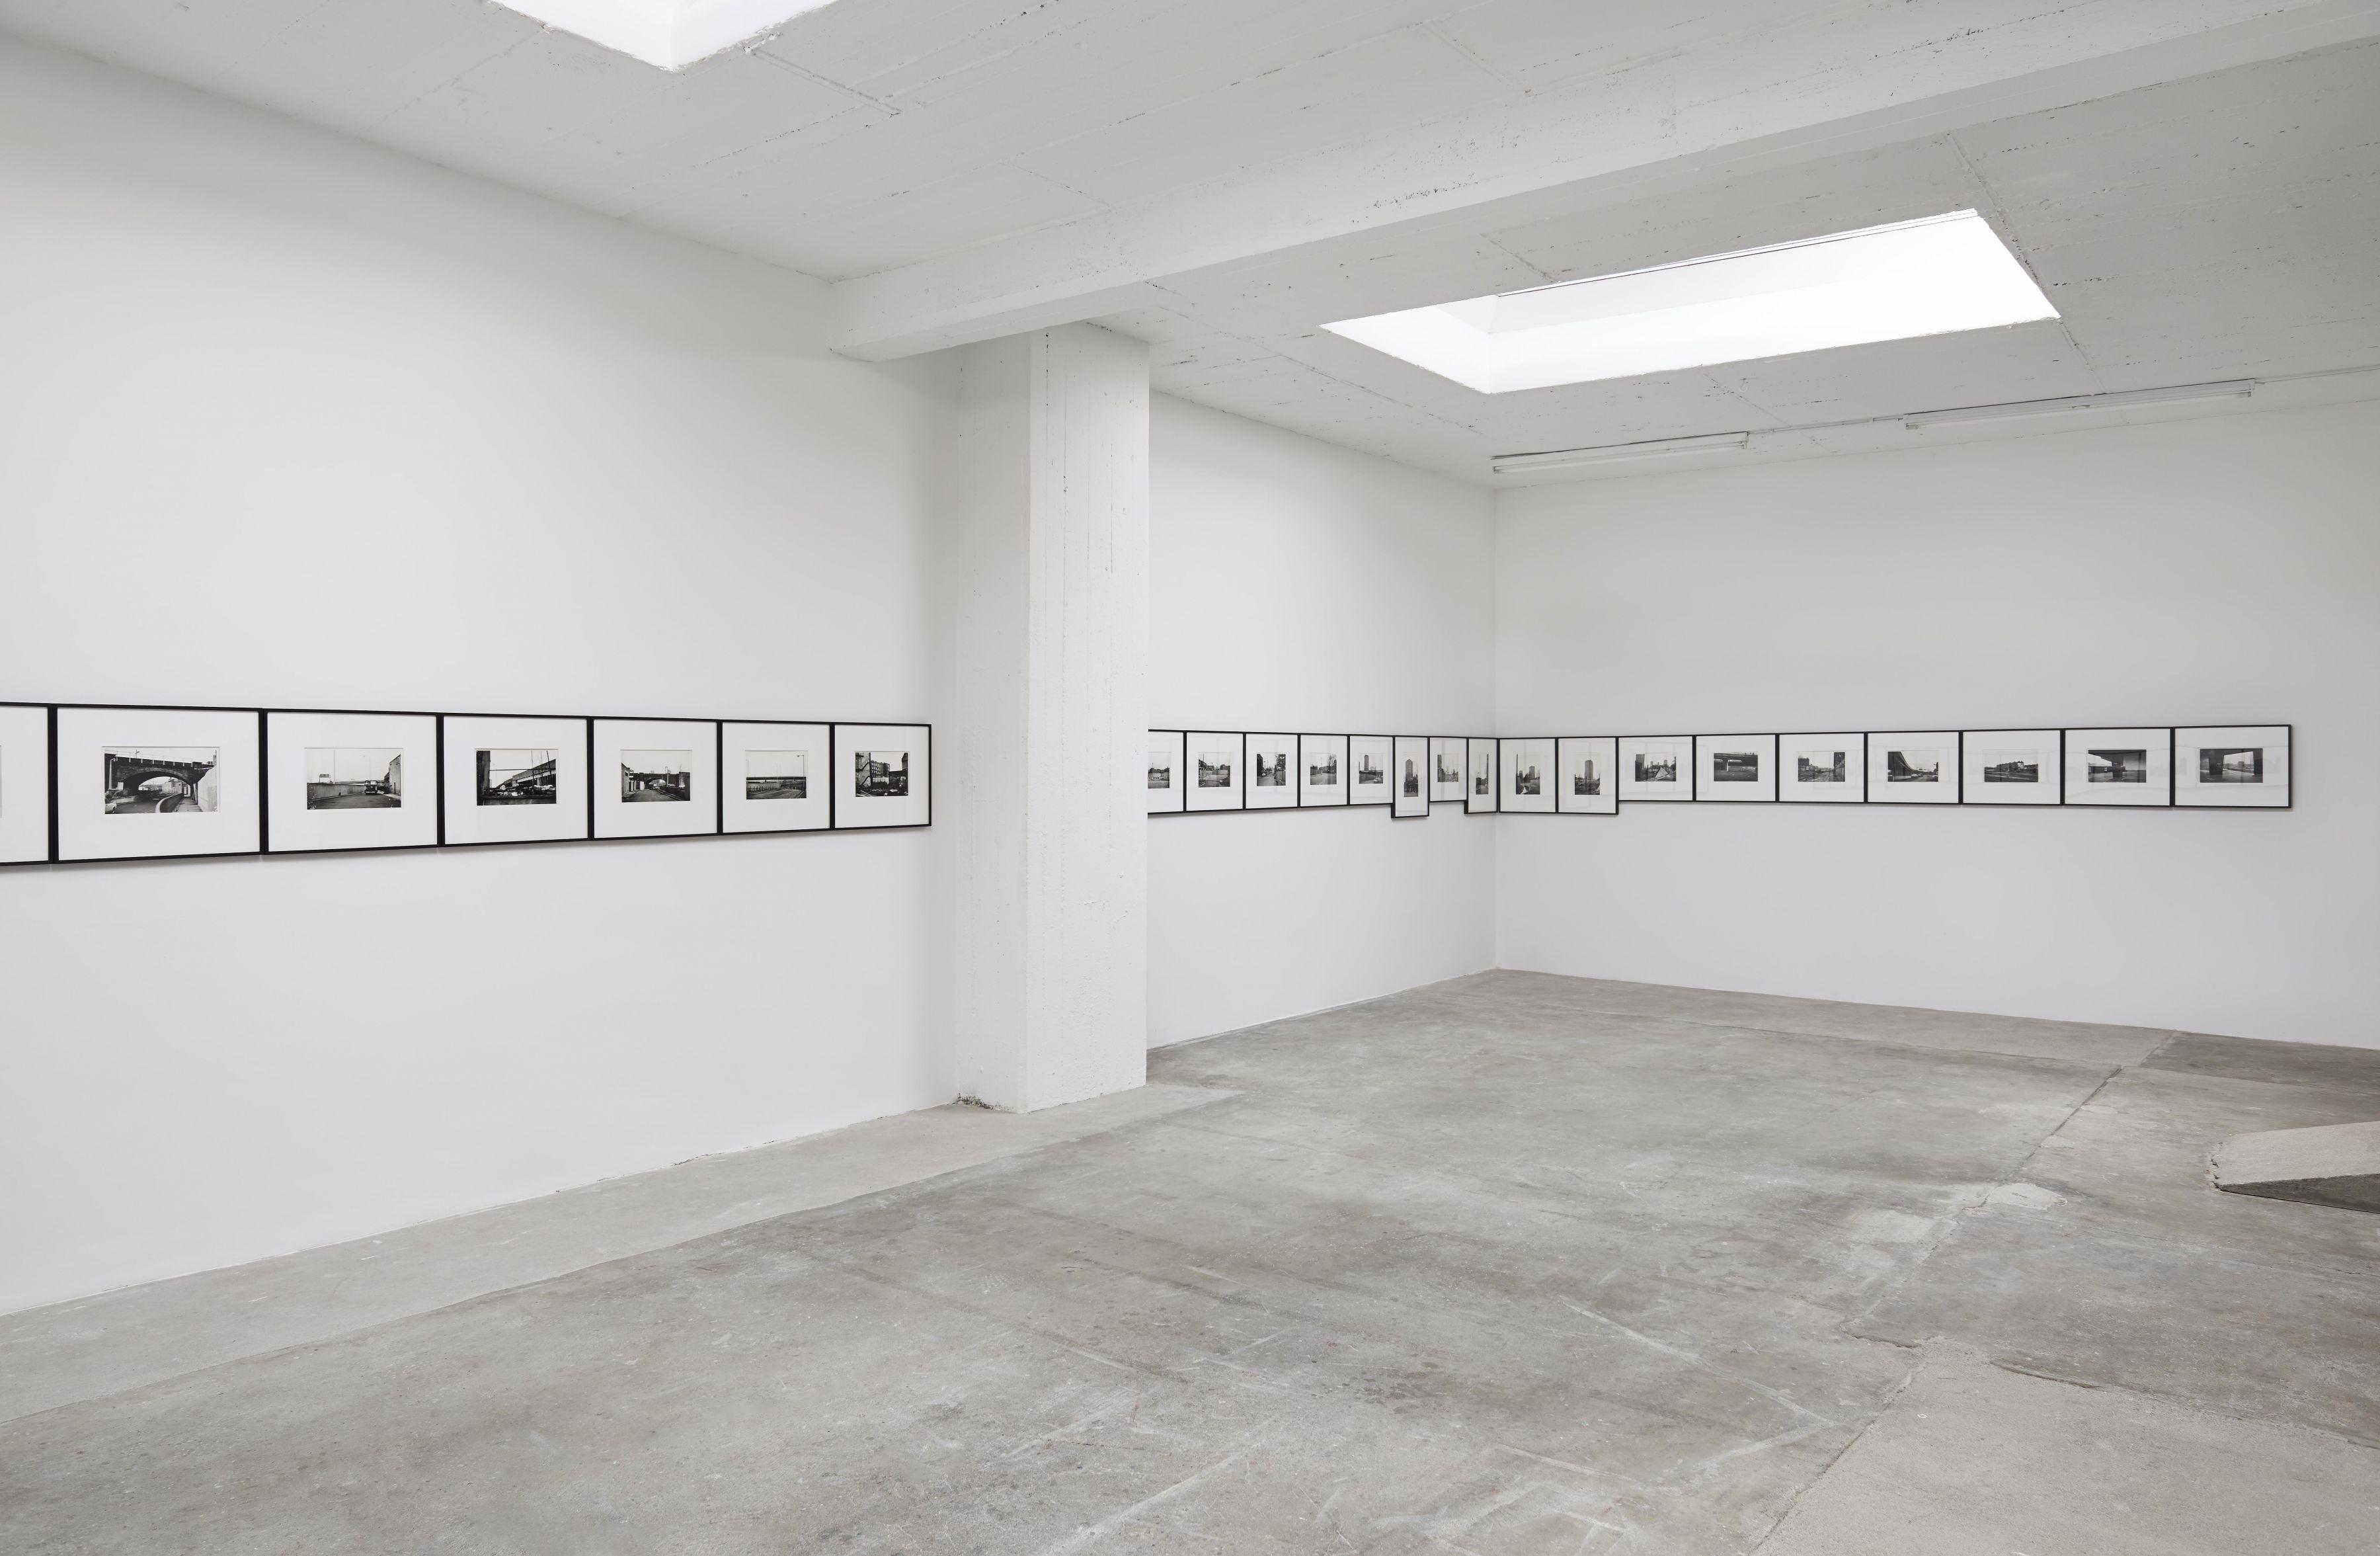 ExhibitionviewJon SavageUninhabited London1977/2016,LinnLühn2016